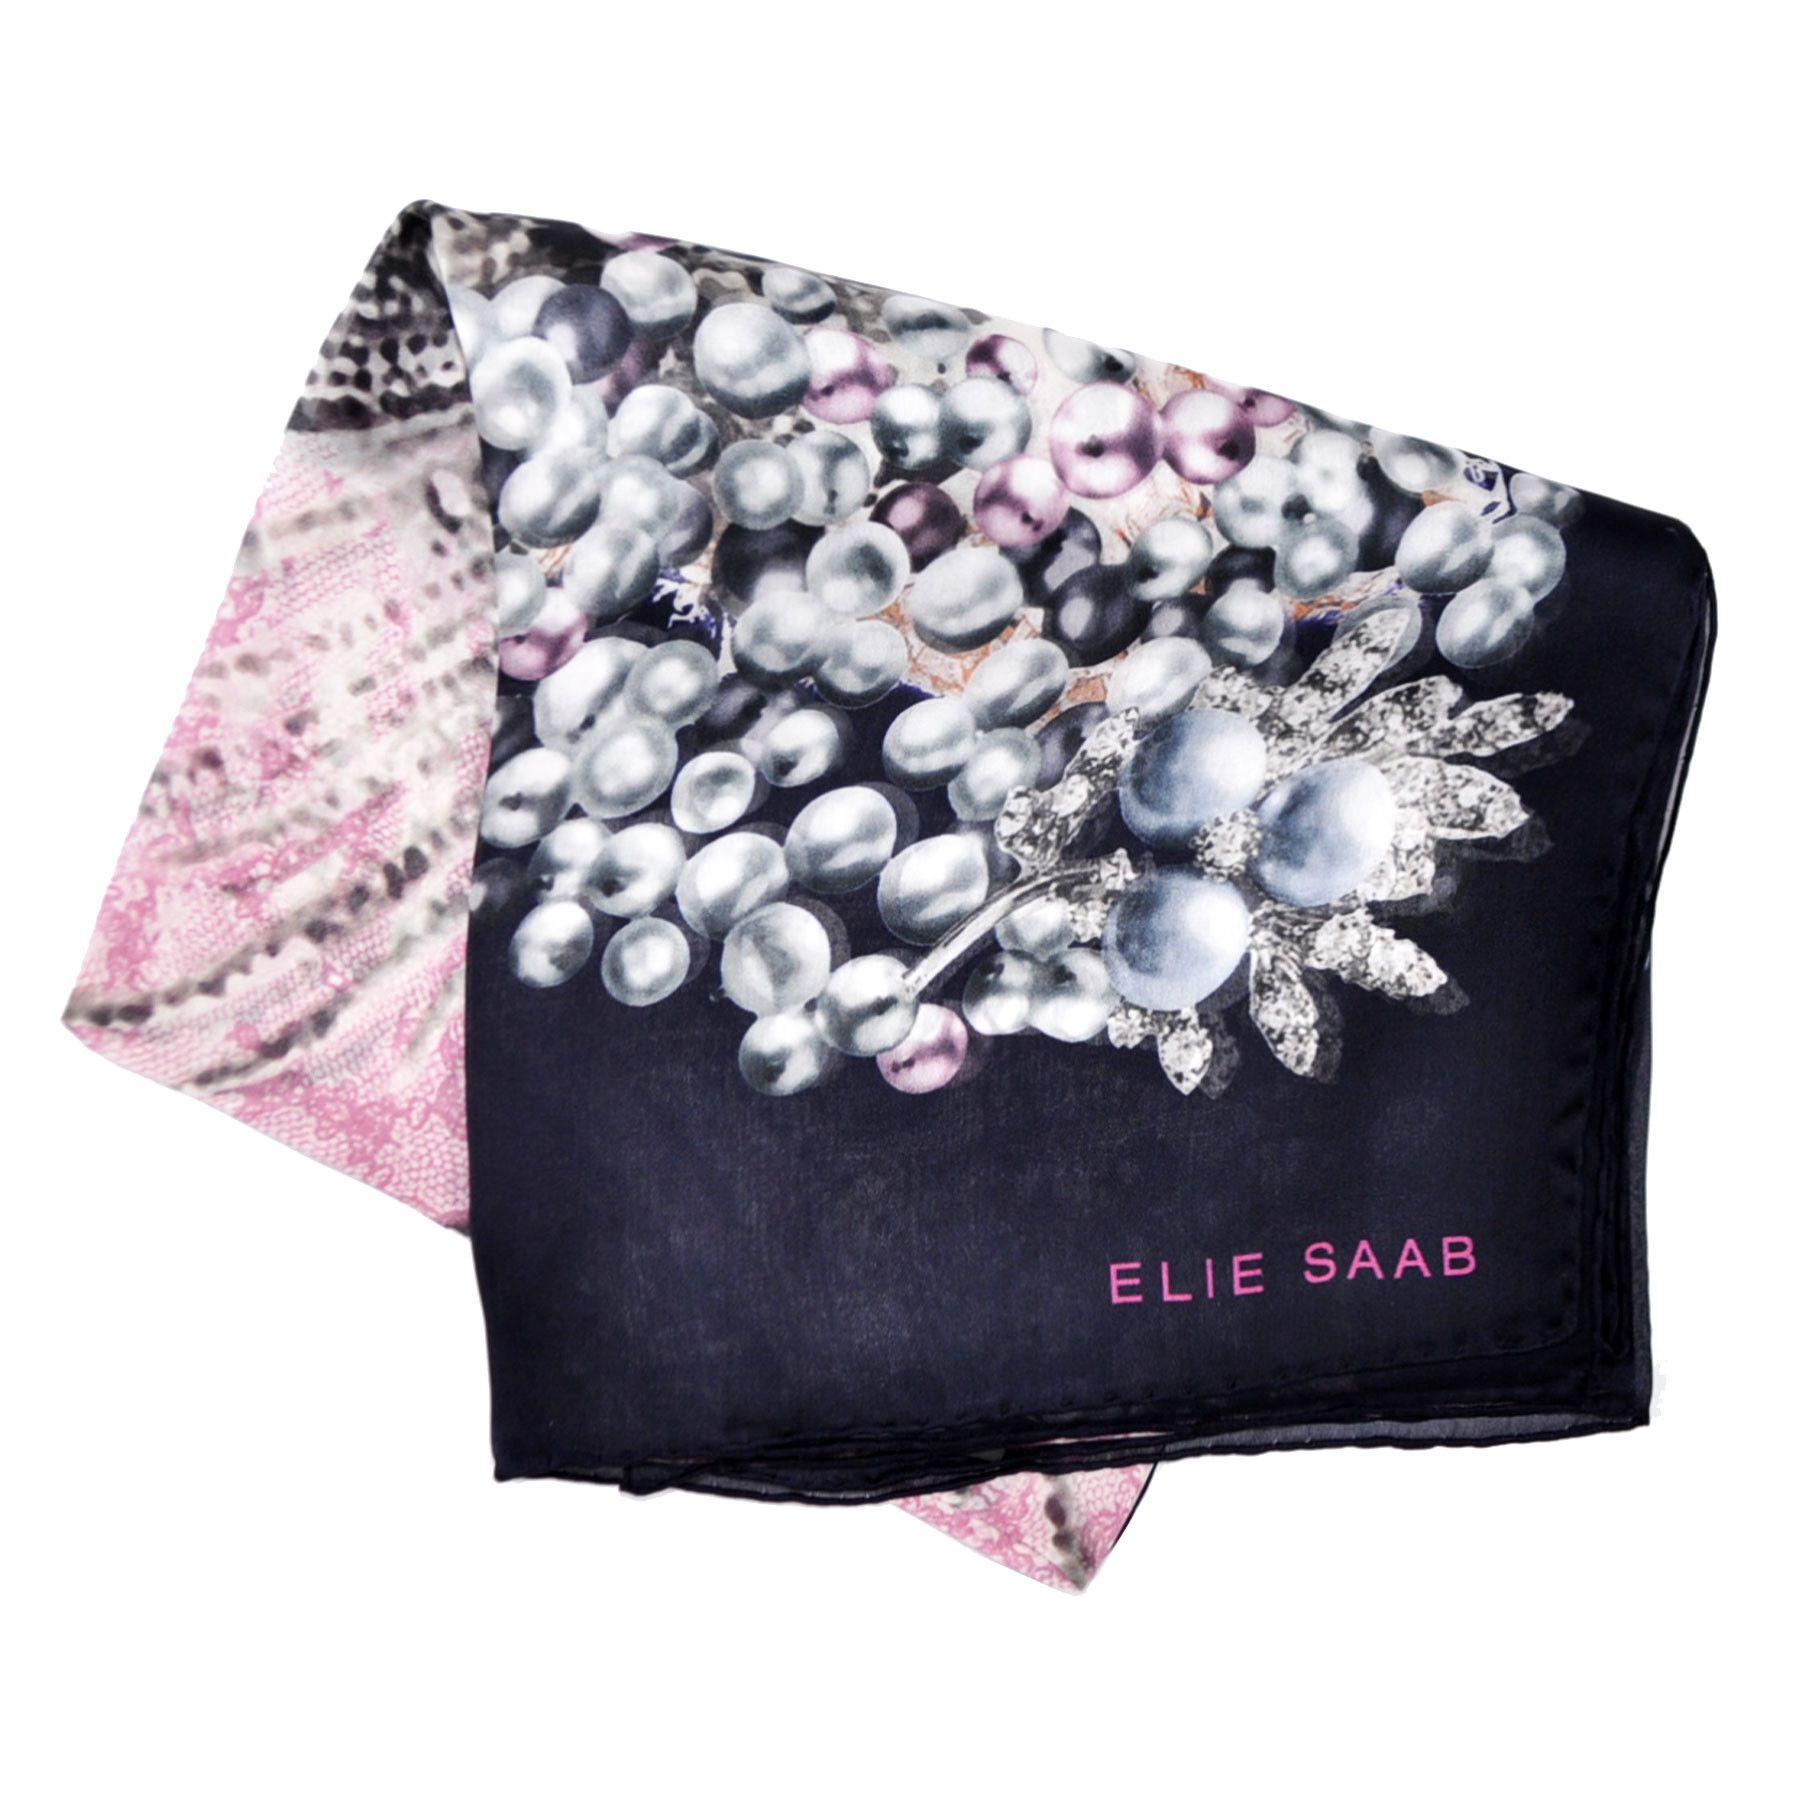 9219f5787 Elie Saab Scarf Black Pink Pearls Design Chiffon Silk Stola from Como Milano